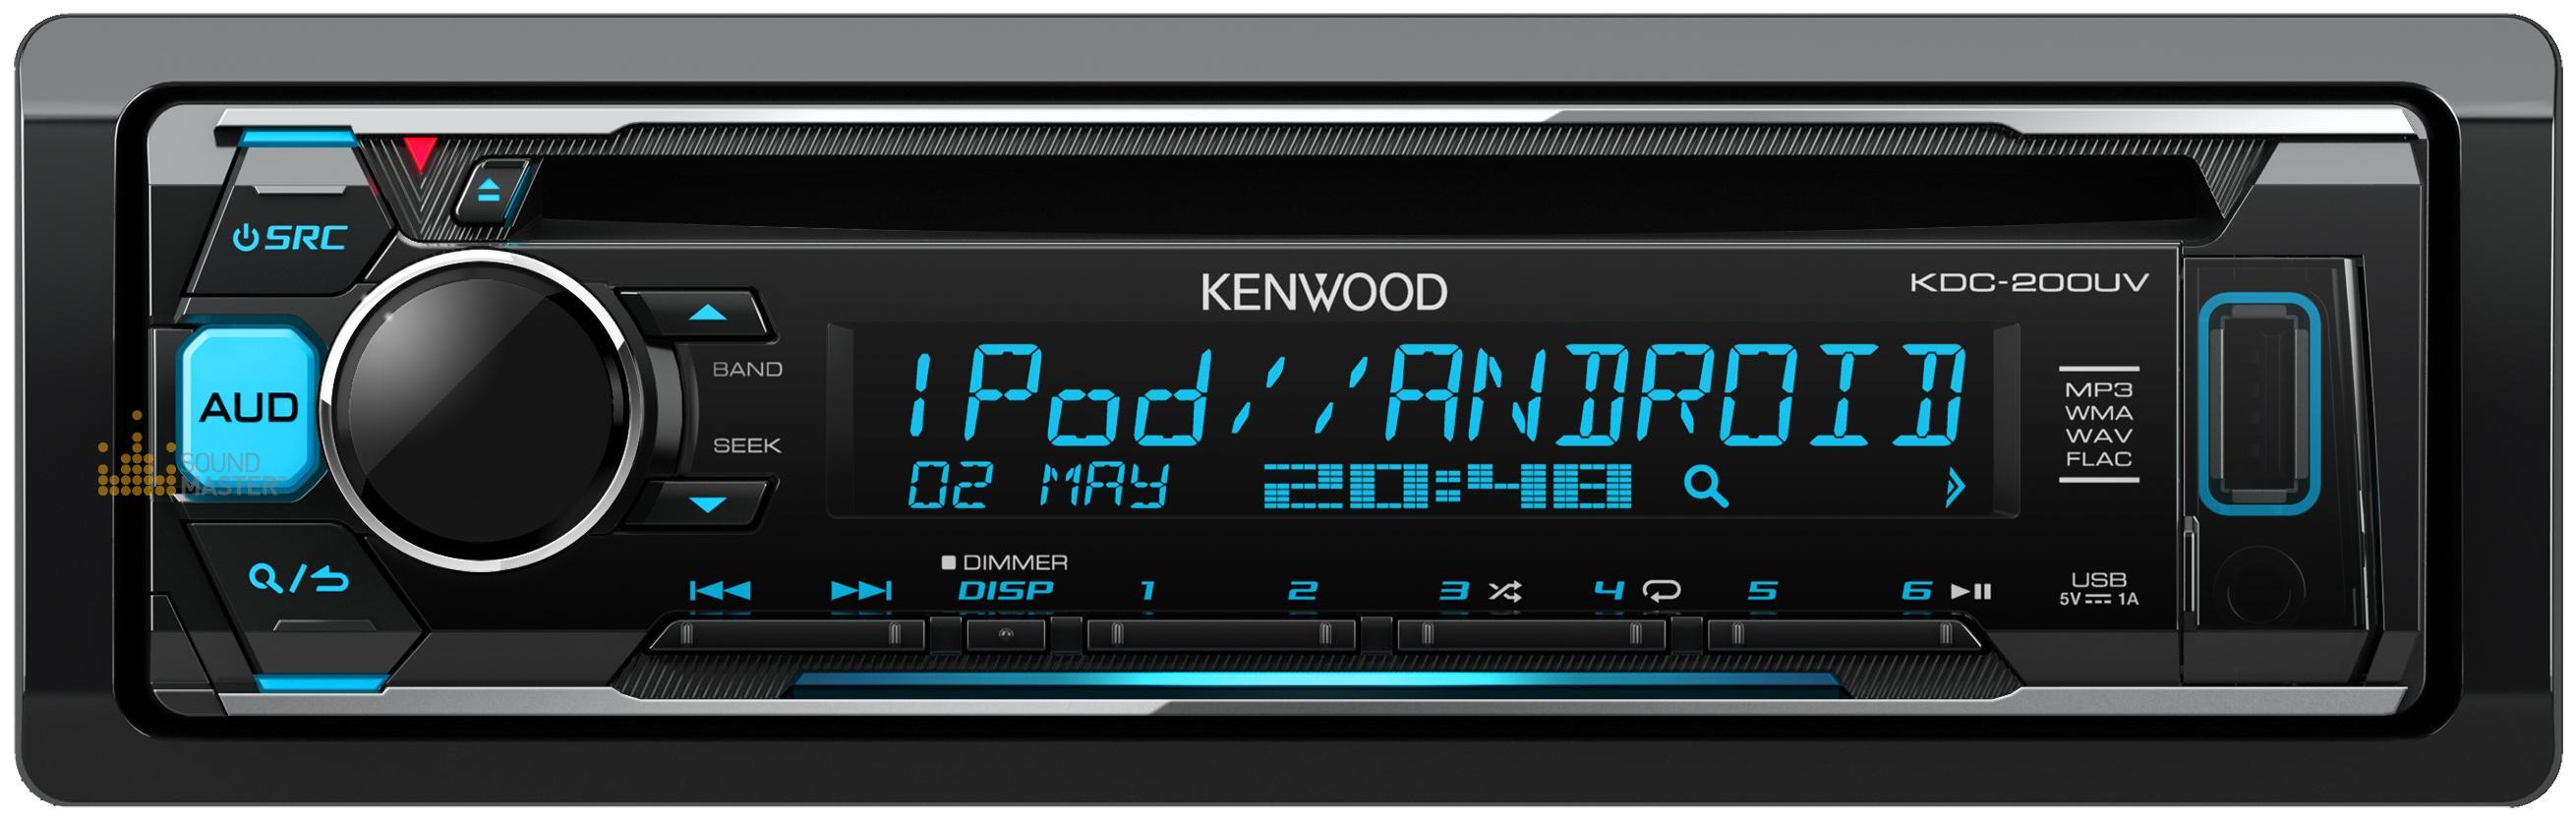 129 kenwood kdc 200uv cd usb iphone android support variable kenwood kdc 200uv cd usb iphone android support variable illumination